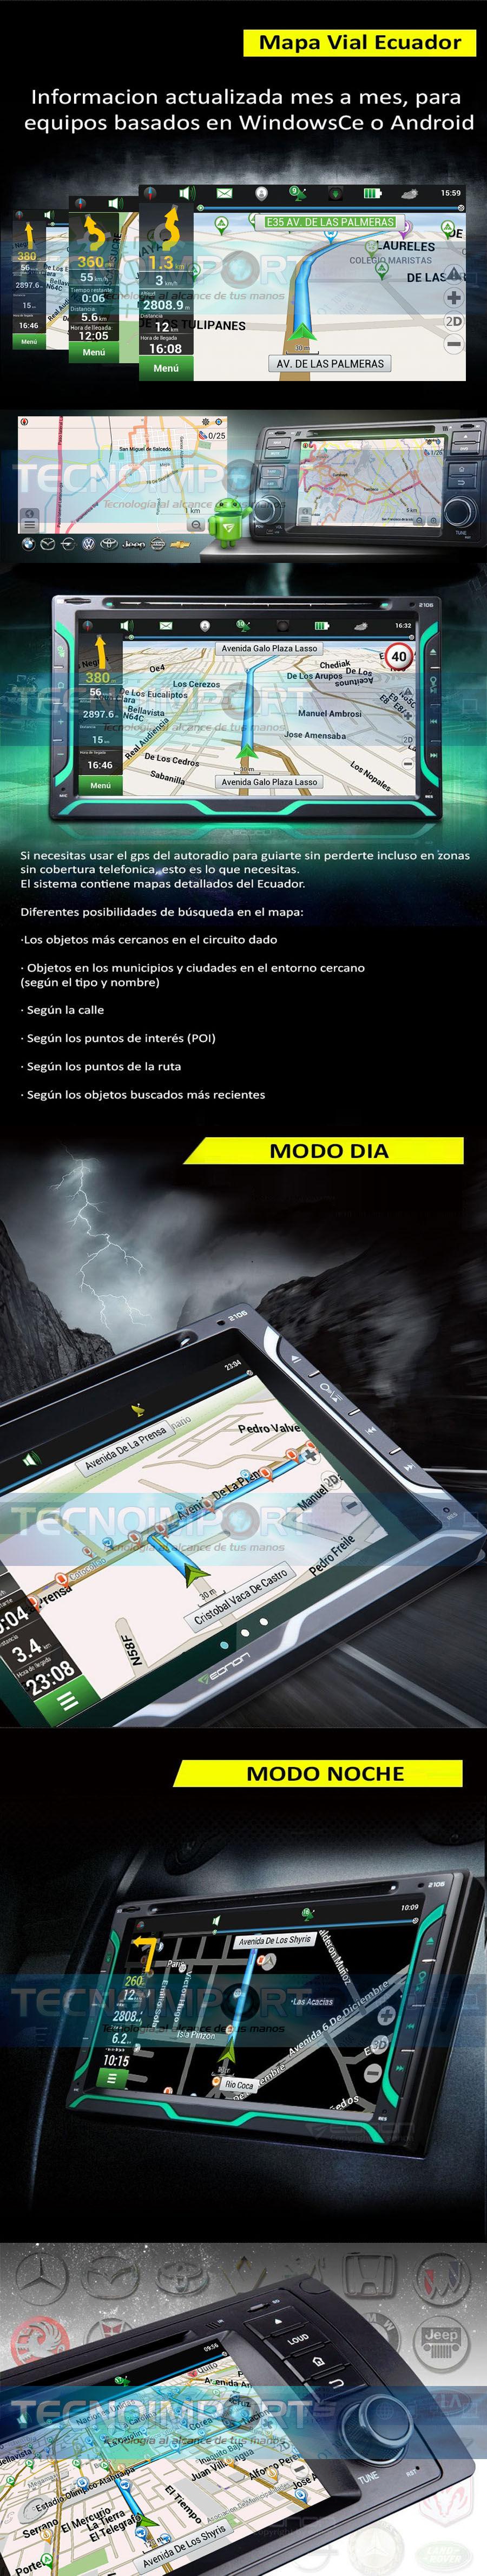 garmingpsradio2